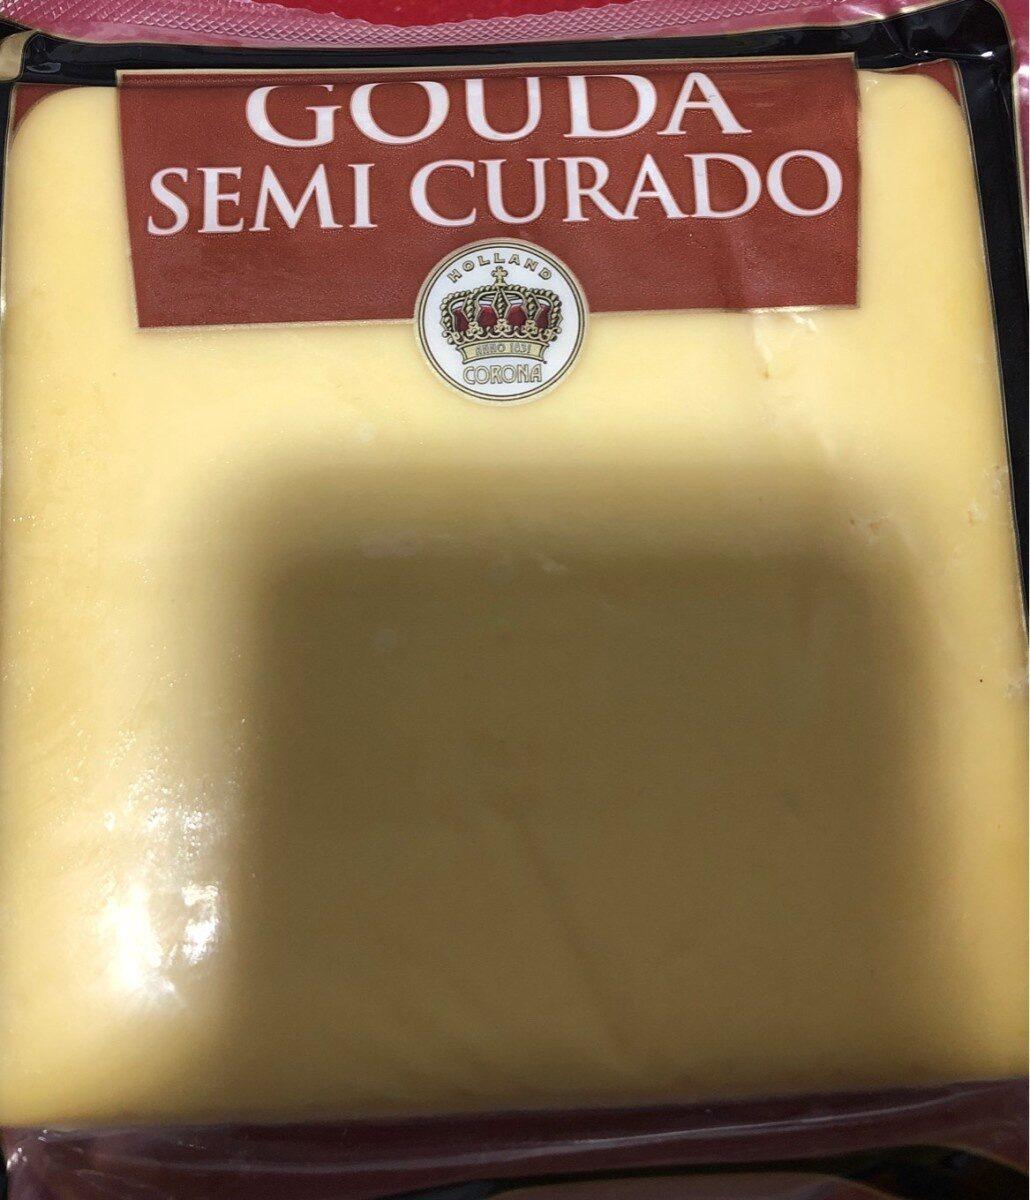 Queso semicurado gouda - Produto - es